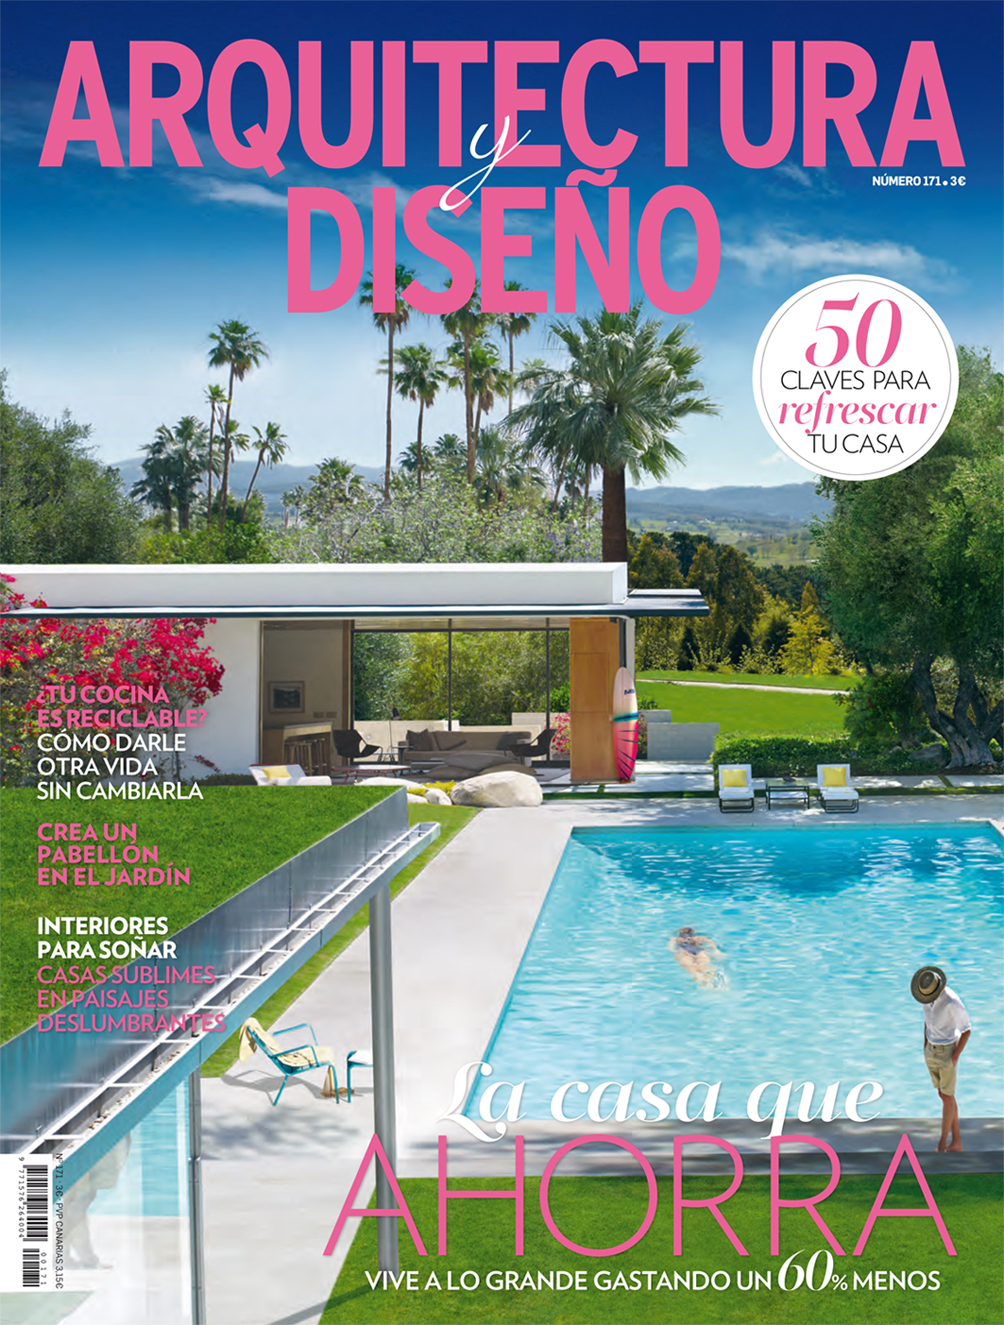 Revista arquitectura y dise o interiorismo for Revista habitat arquitectura diseno interiorismo